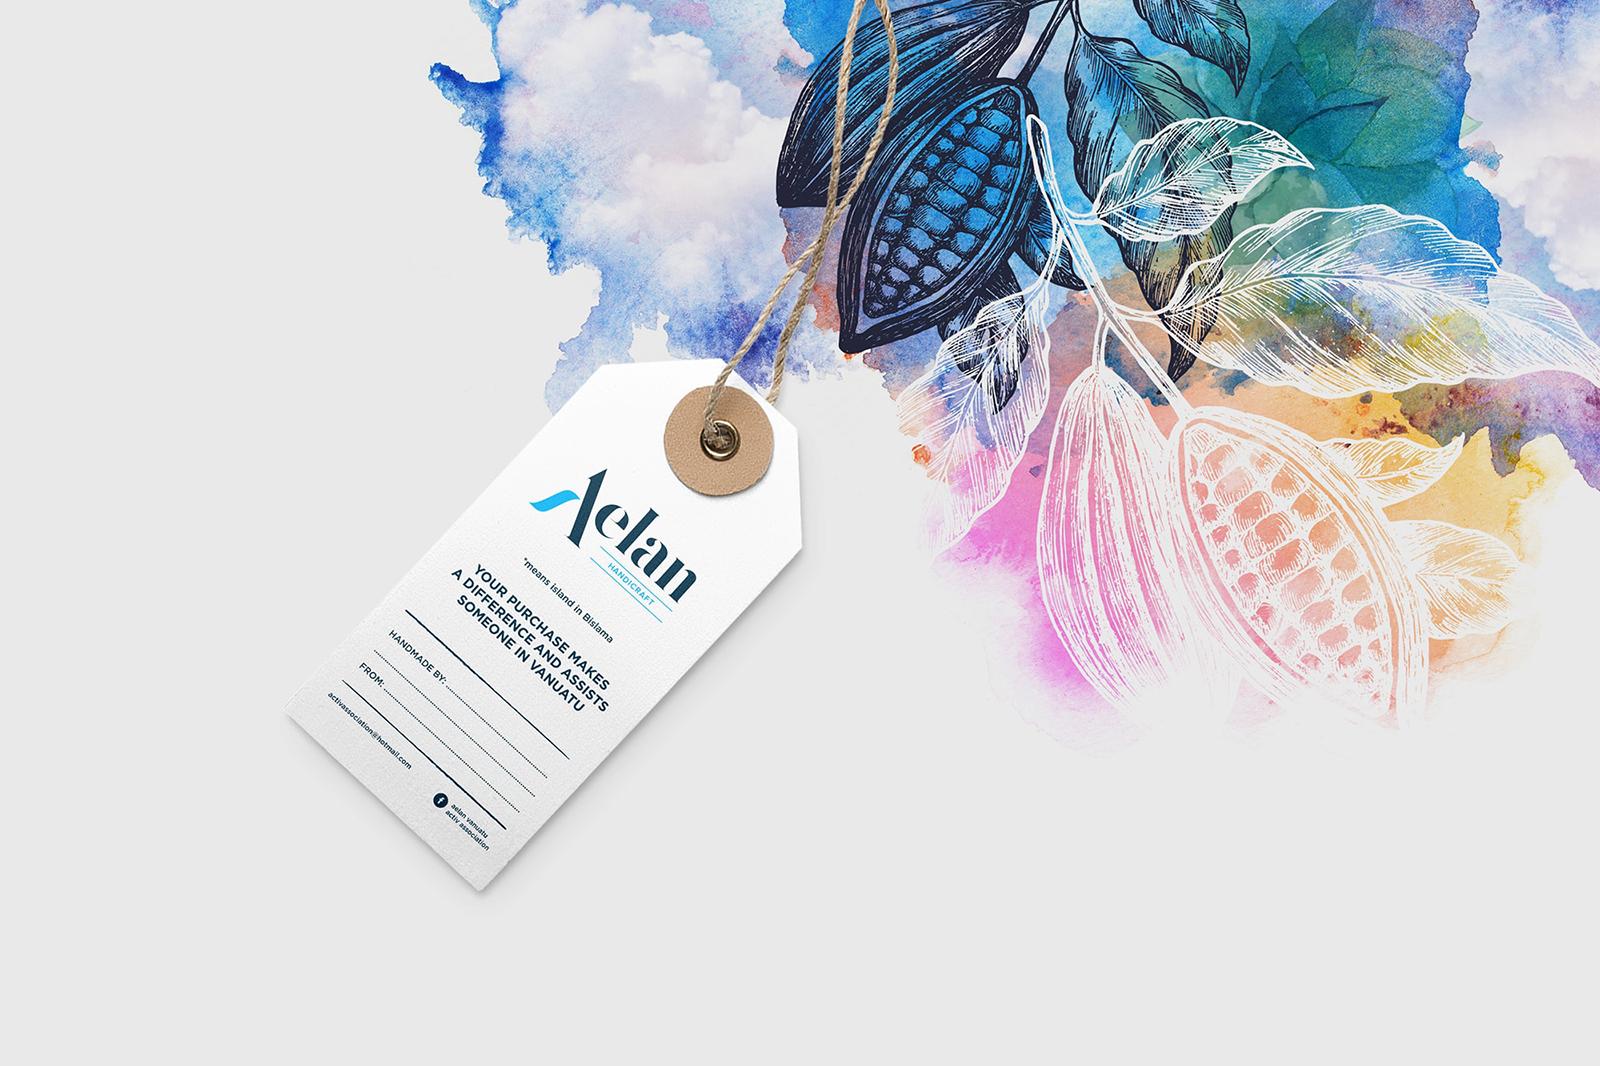 Aelan-Label-min1